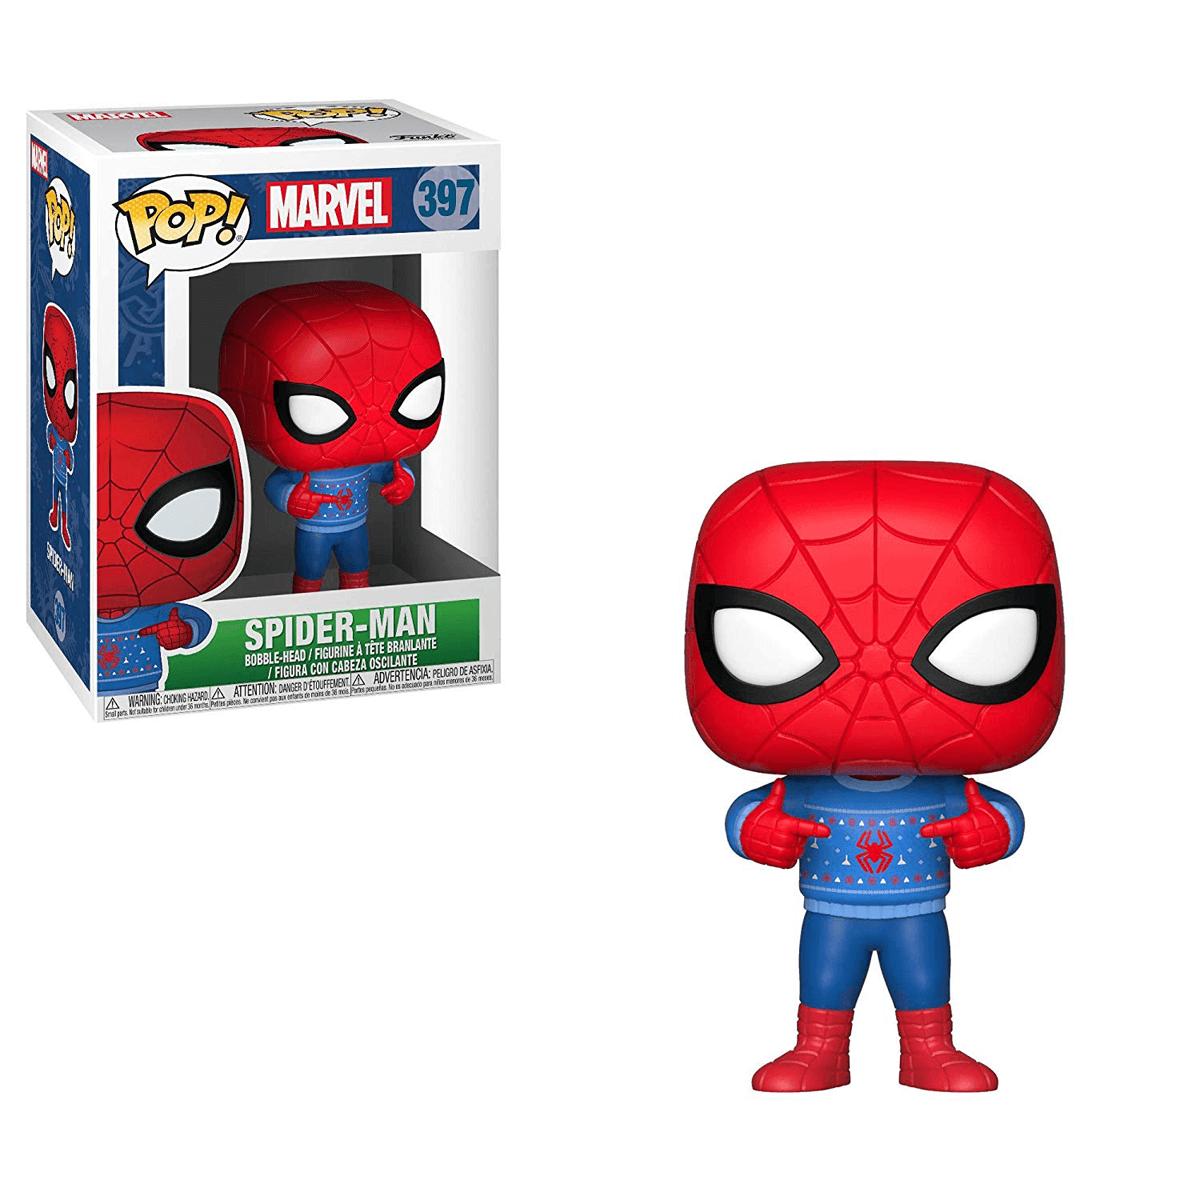 Spiderman Christmas.Funko Pop Marvel Spider Man Christmas Edition